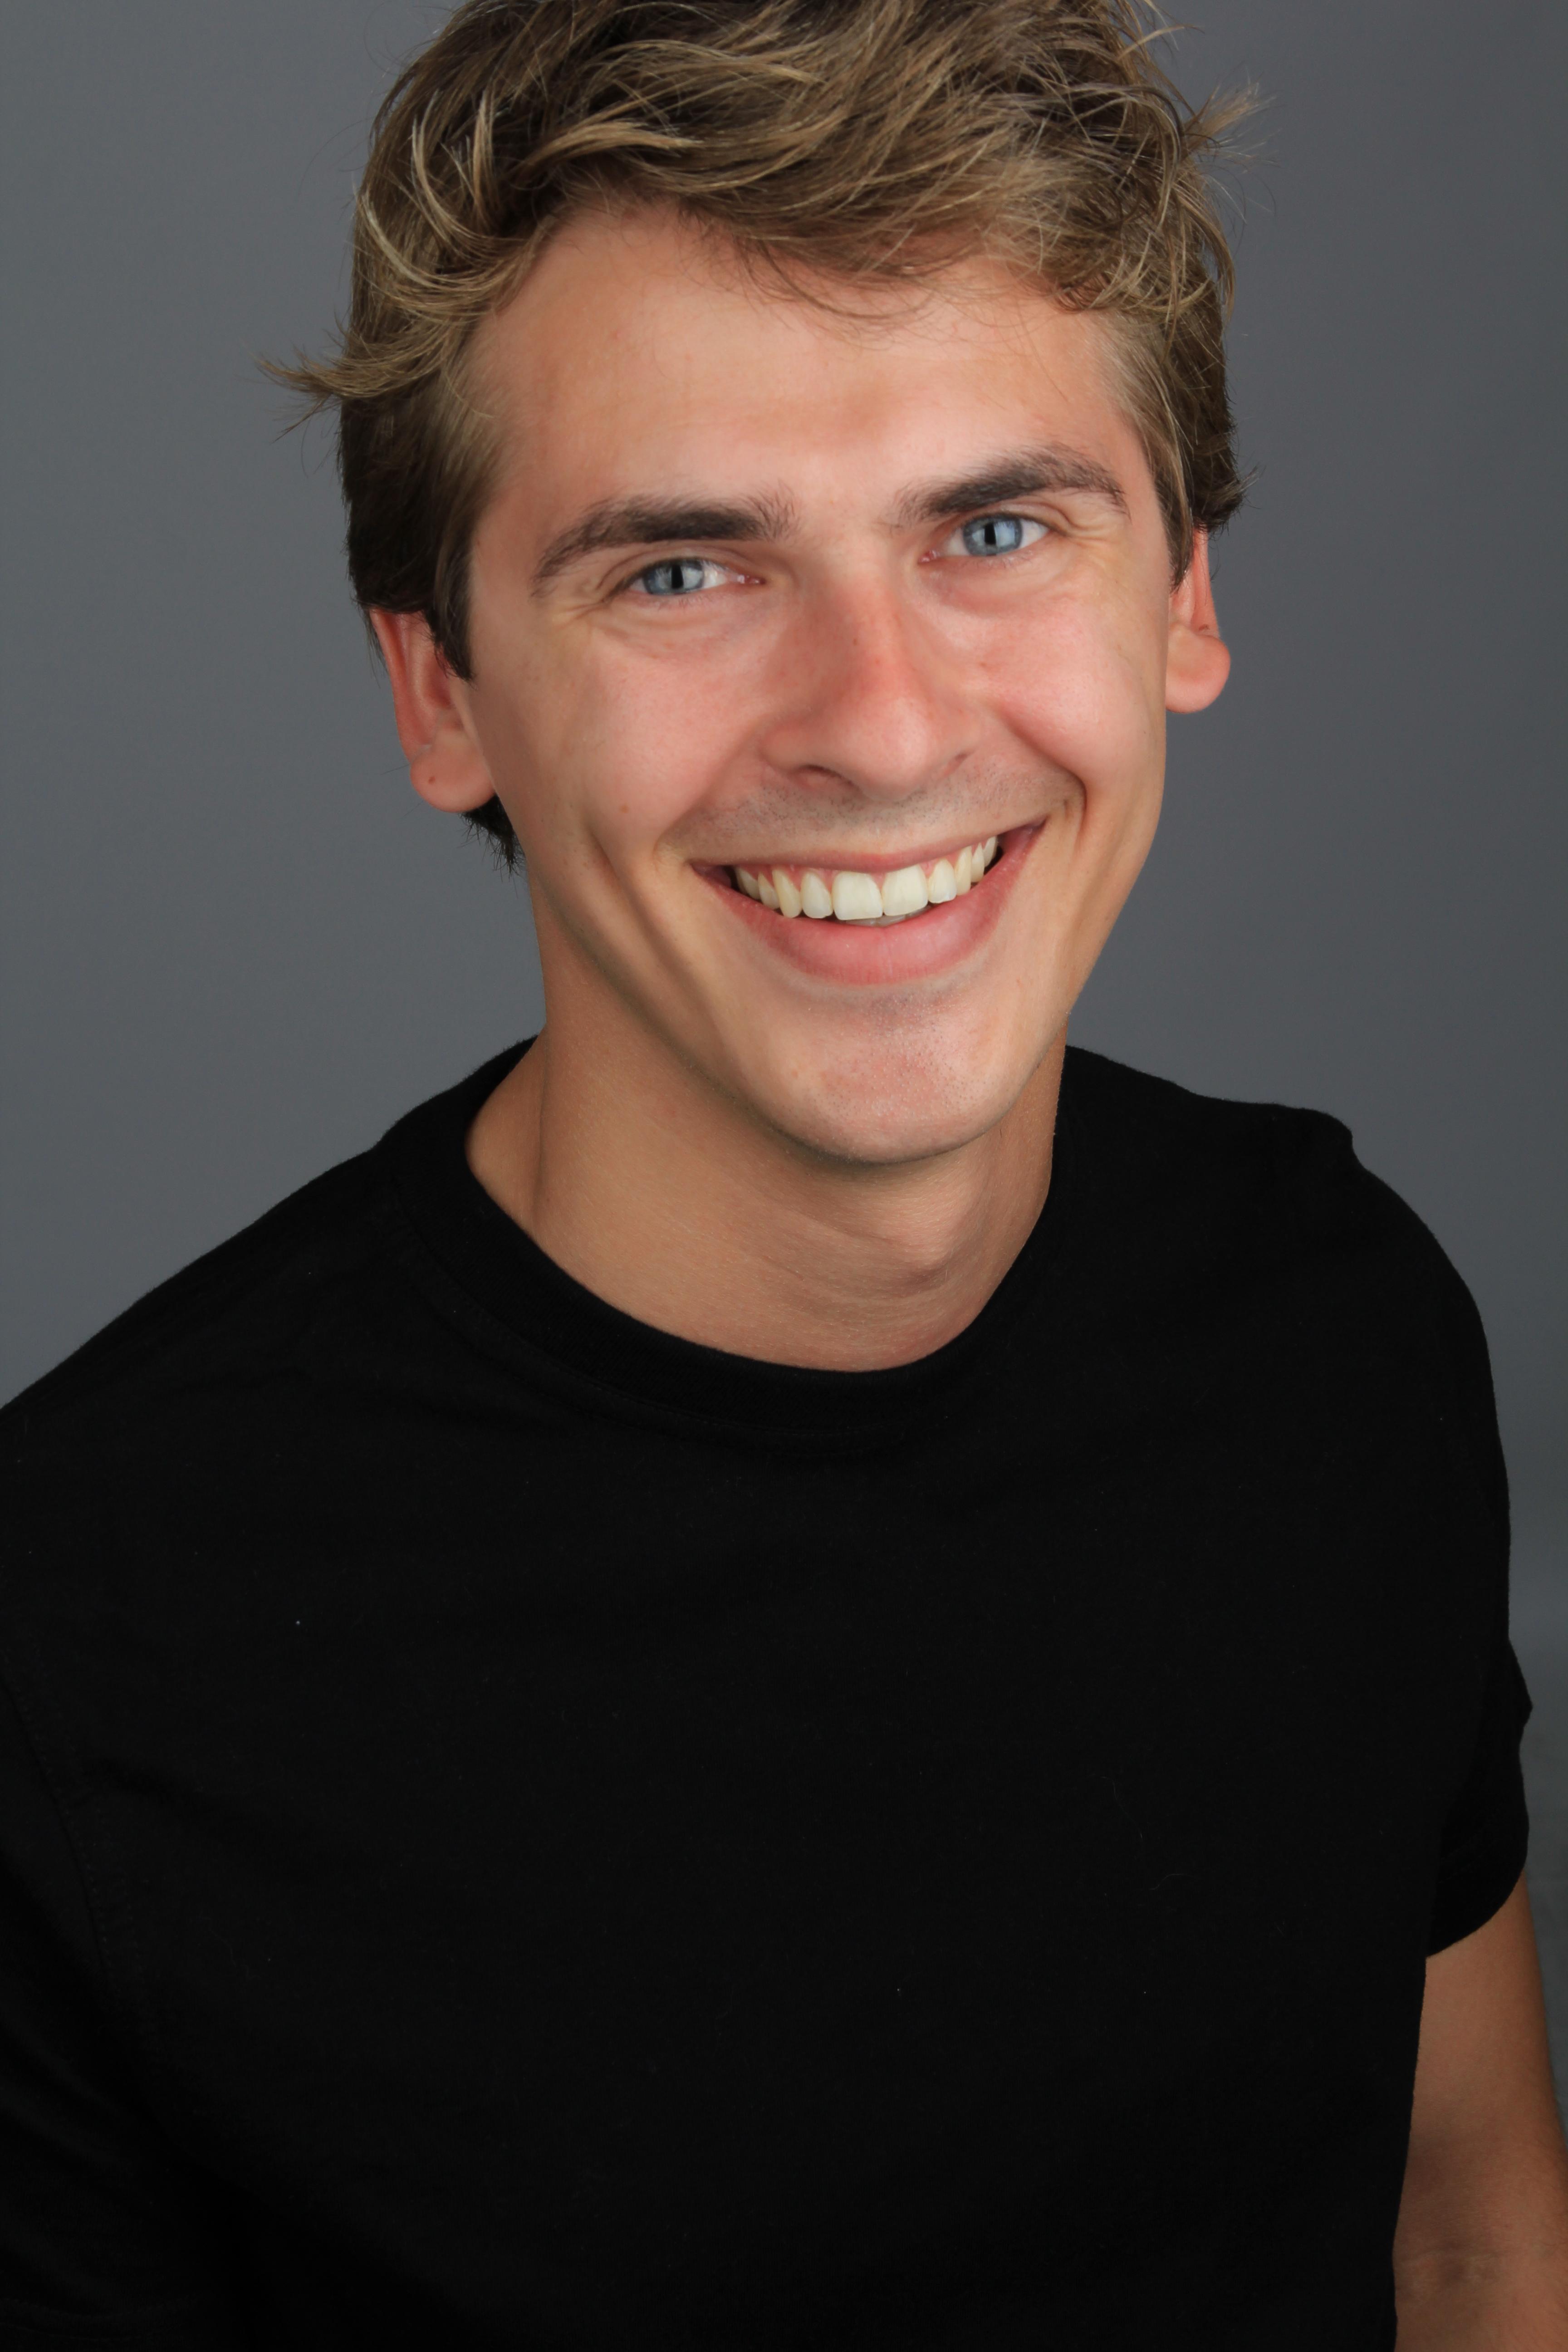 Sander van den Brink